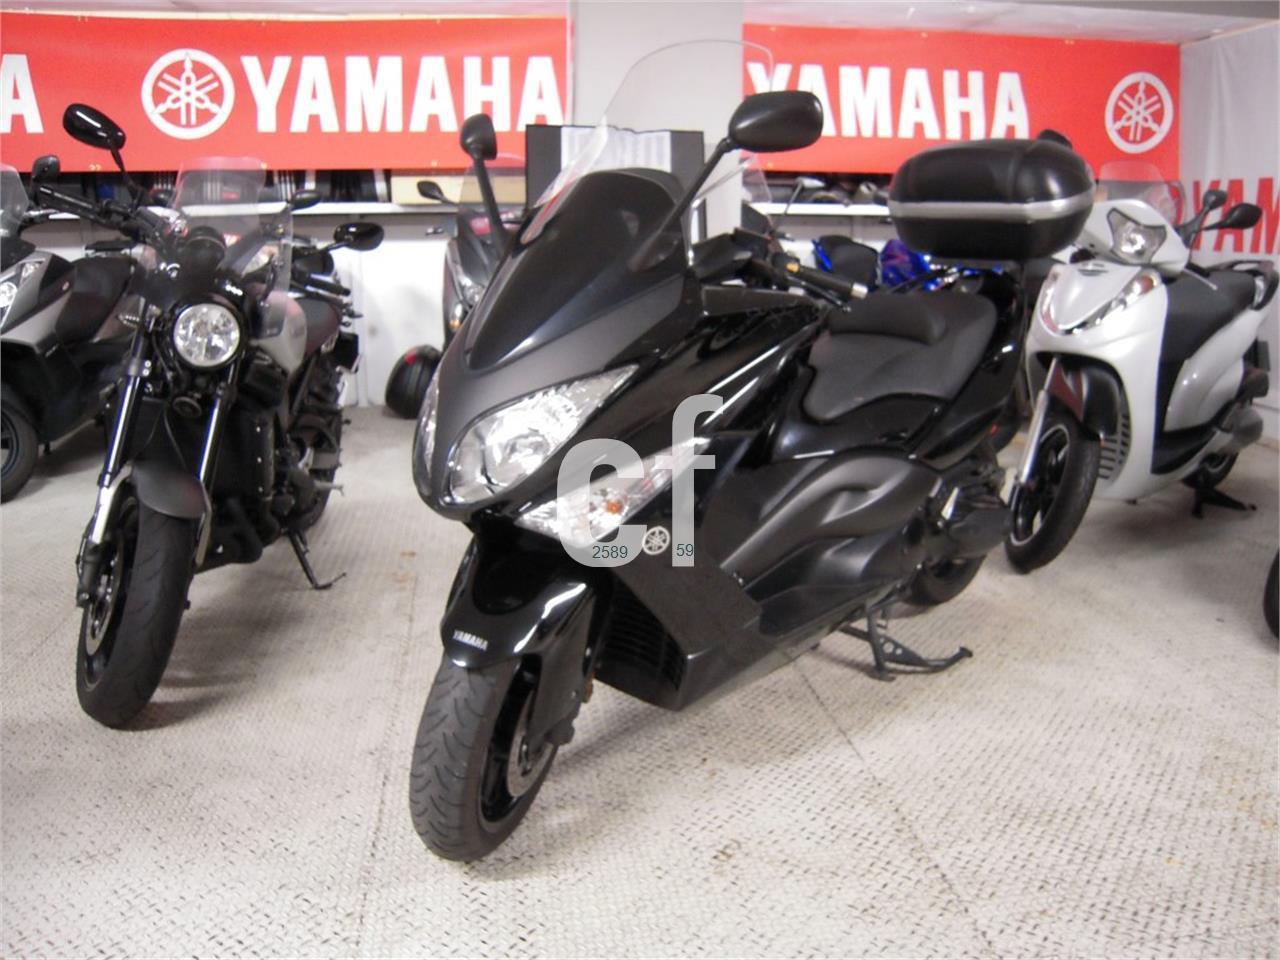 YAMAHA T-MAX 500 ABS